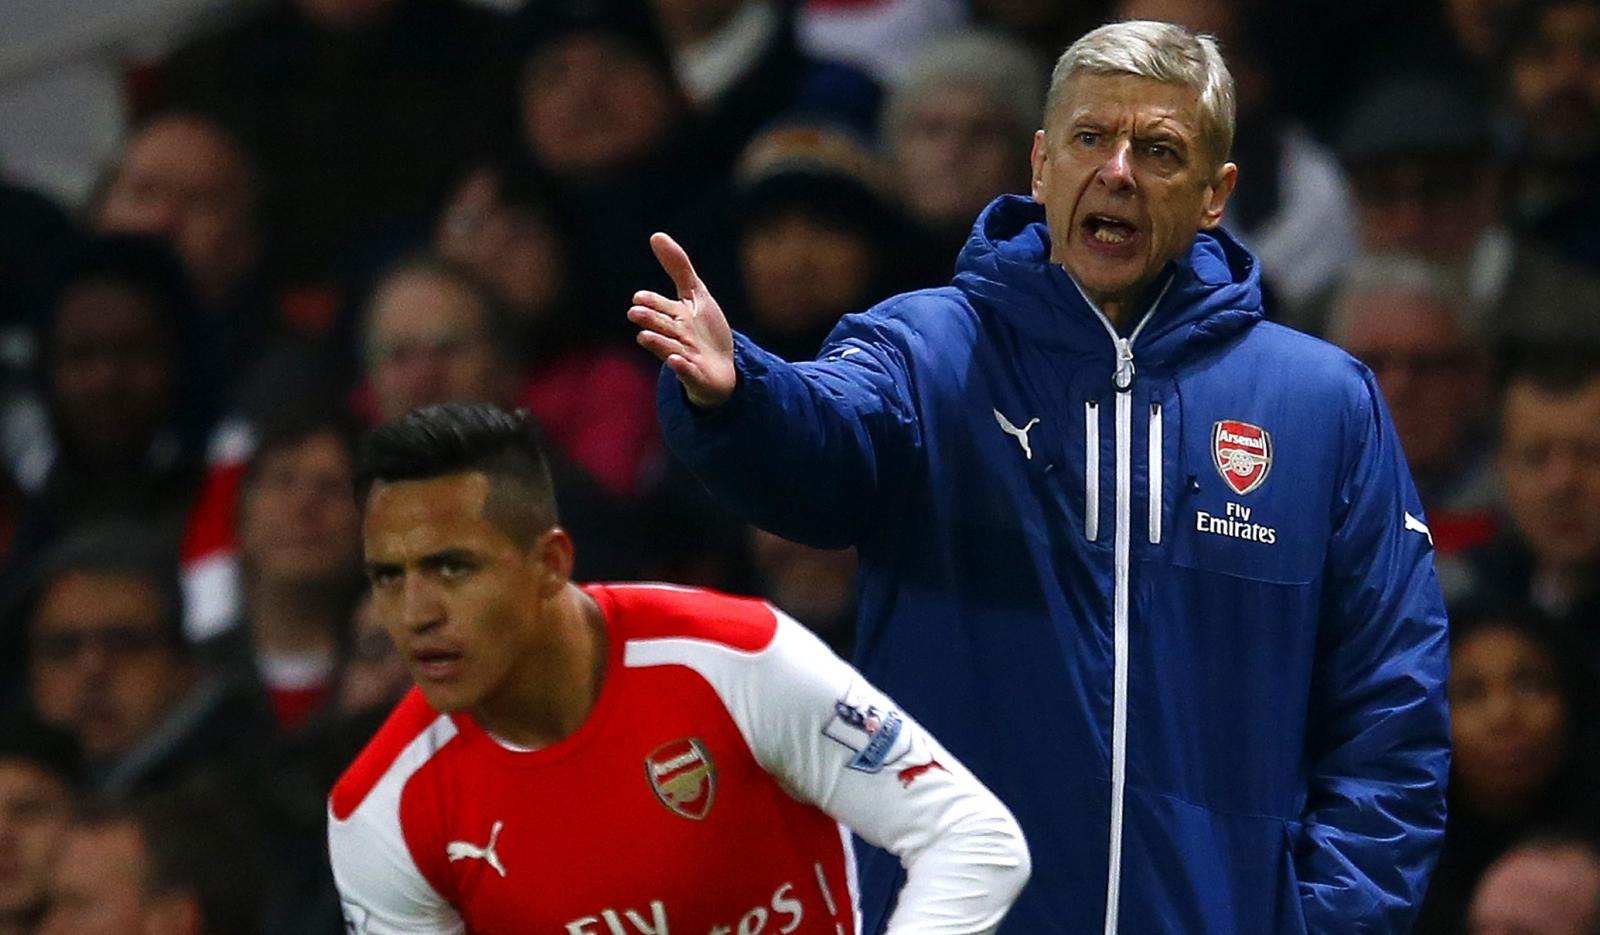 Arsene Wenger and Alexis Sanchez